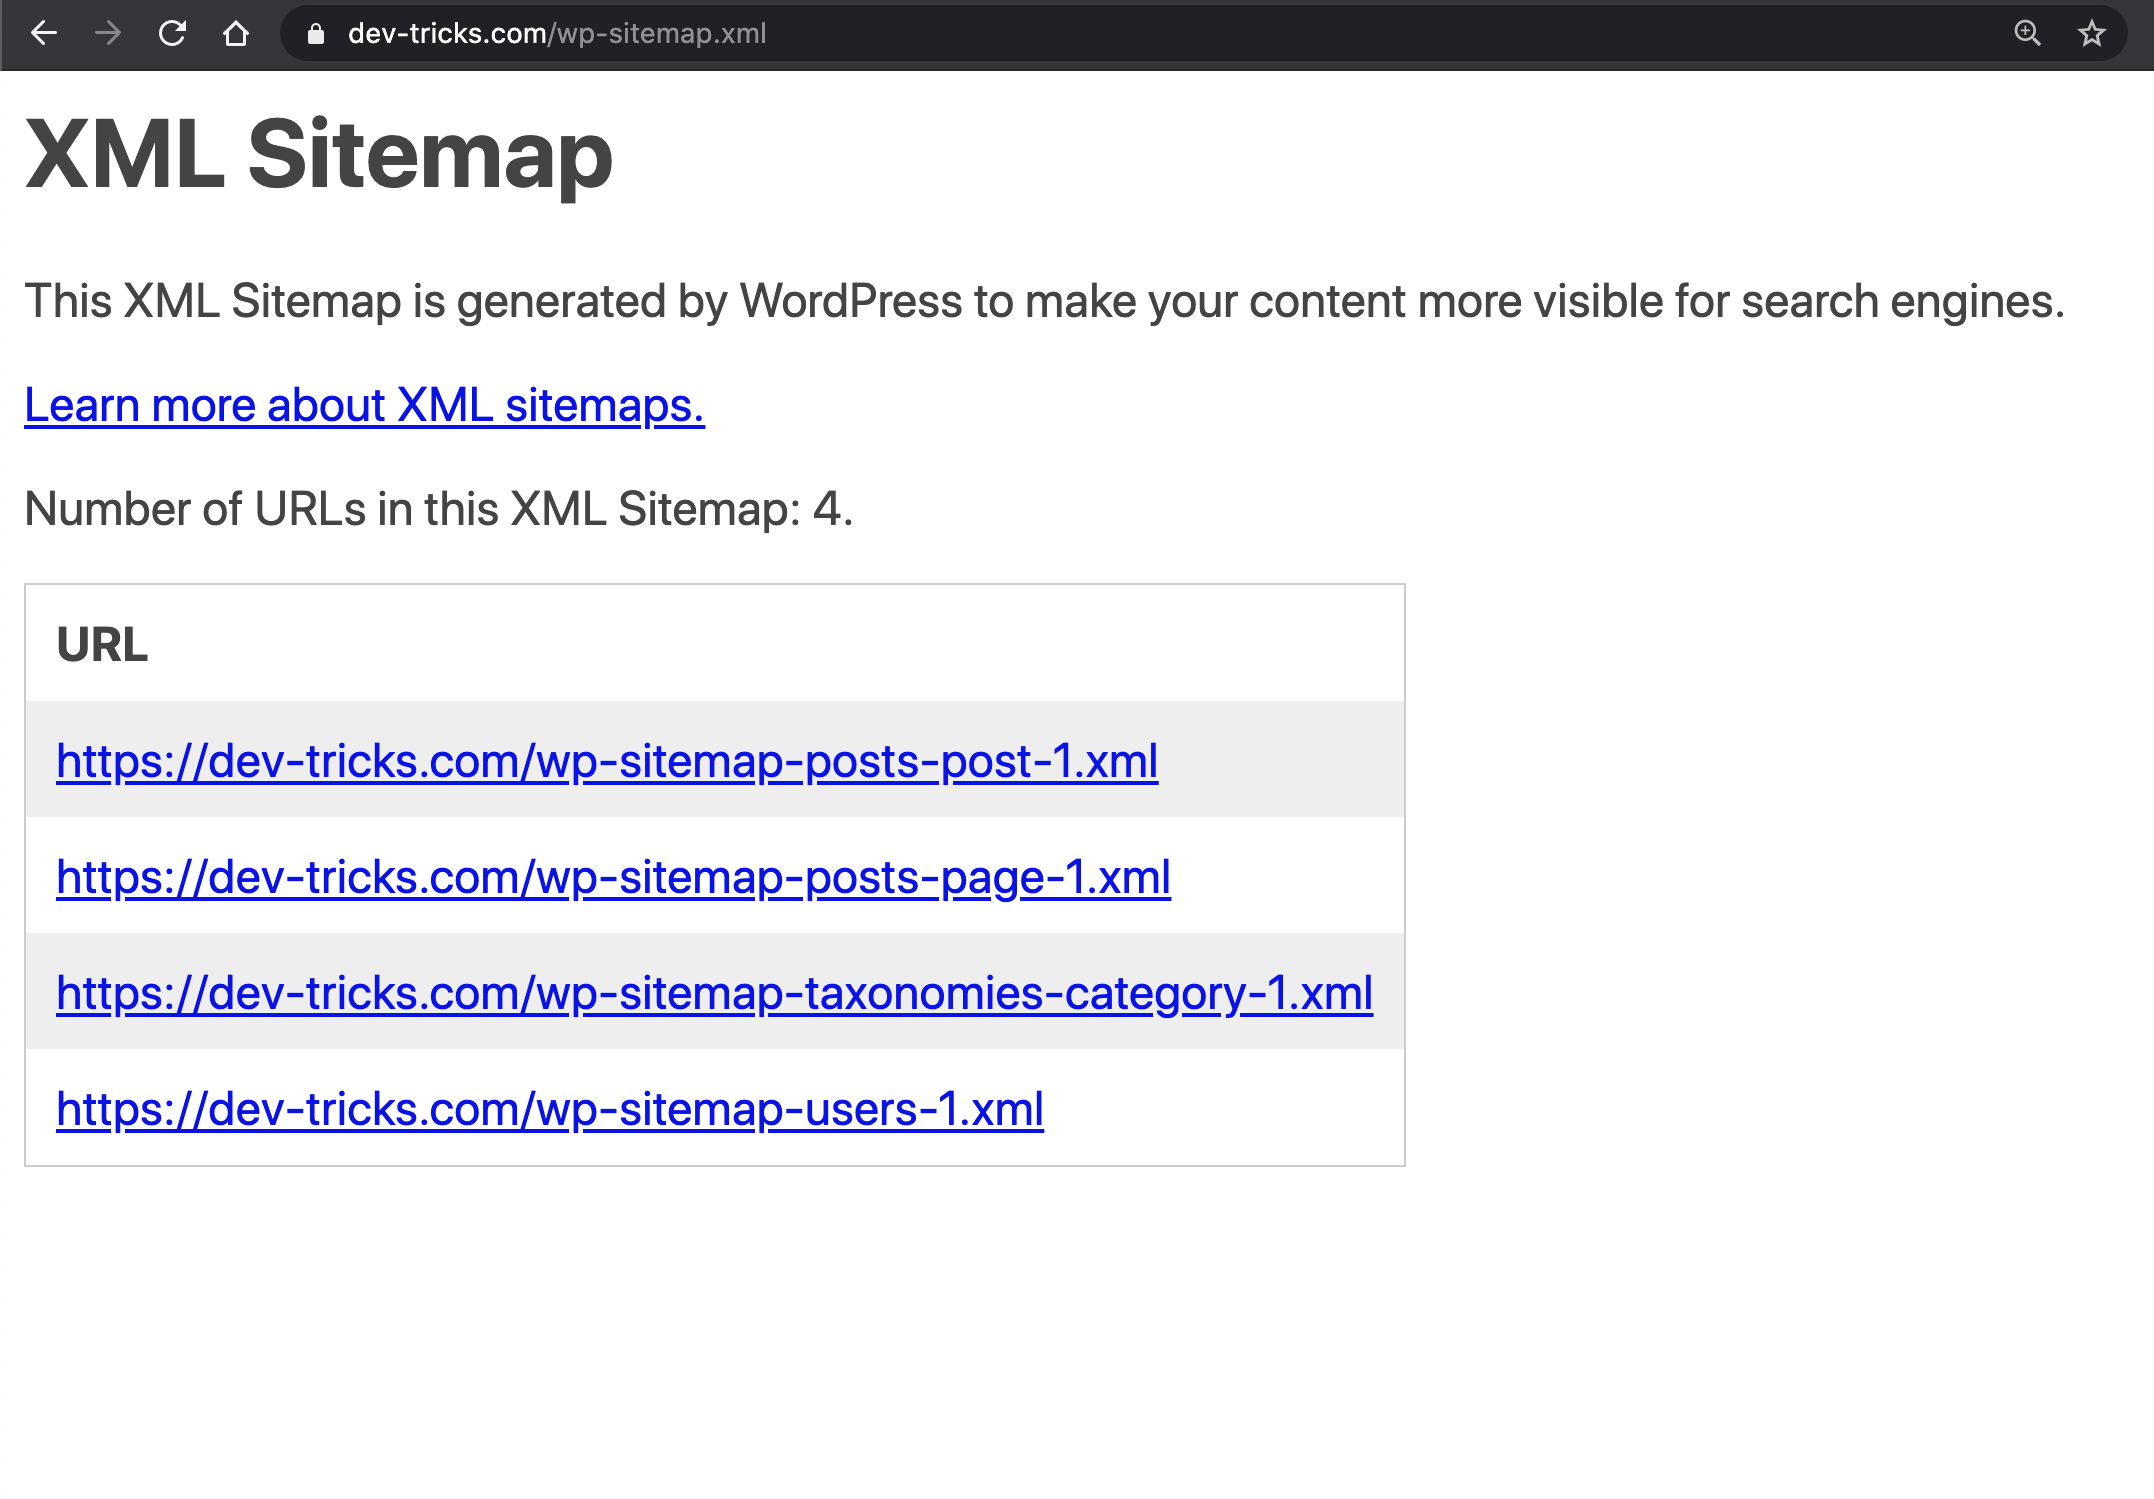 New WP Sitemap rocking at Dev-Tricks.com